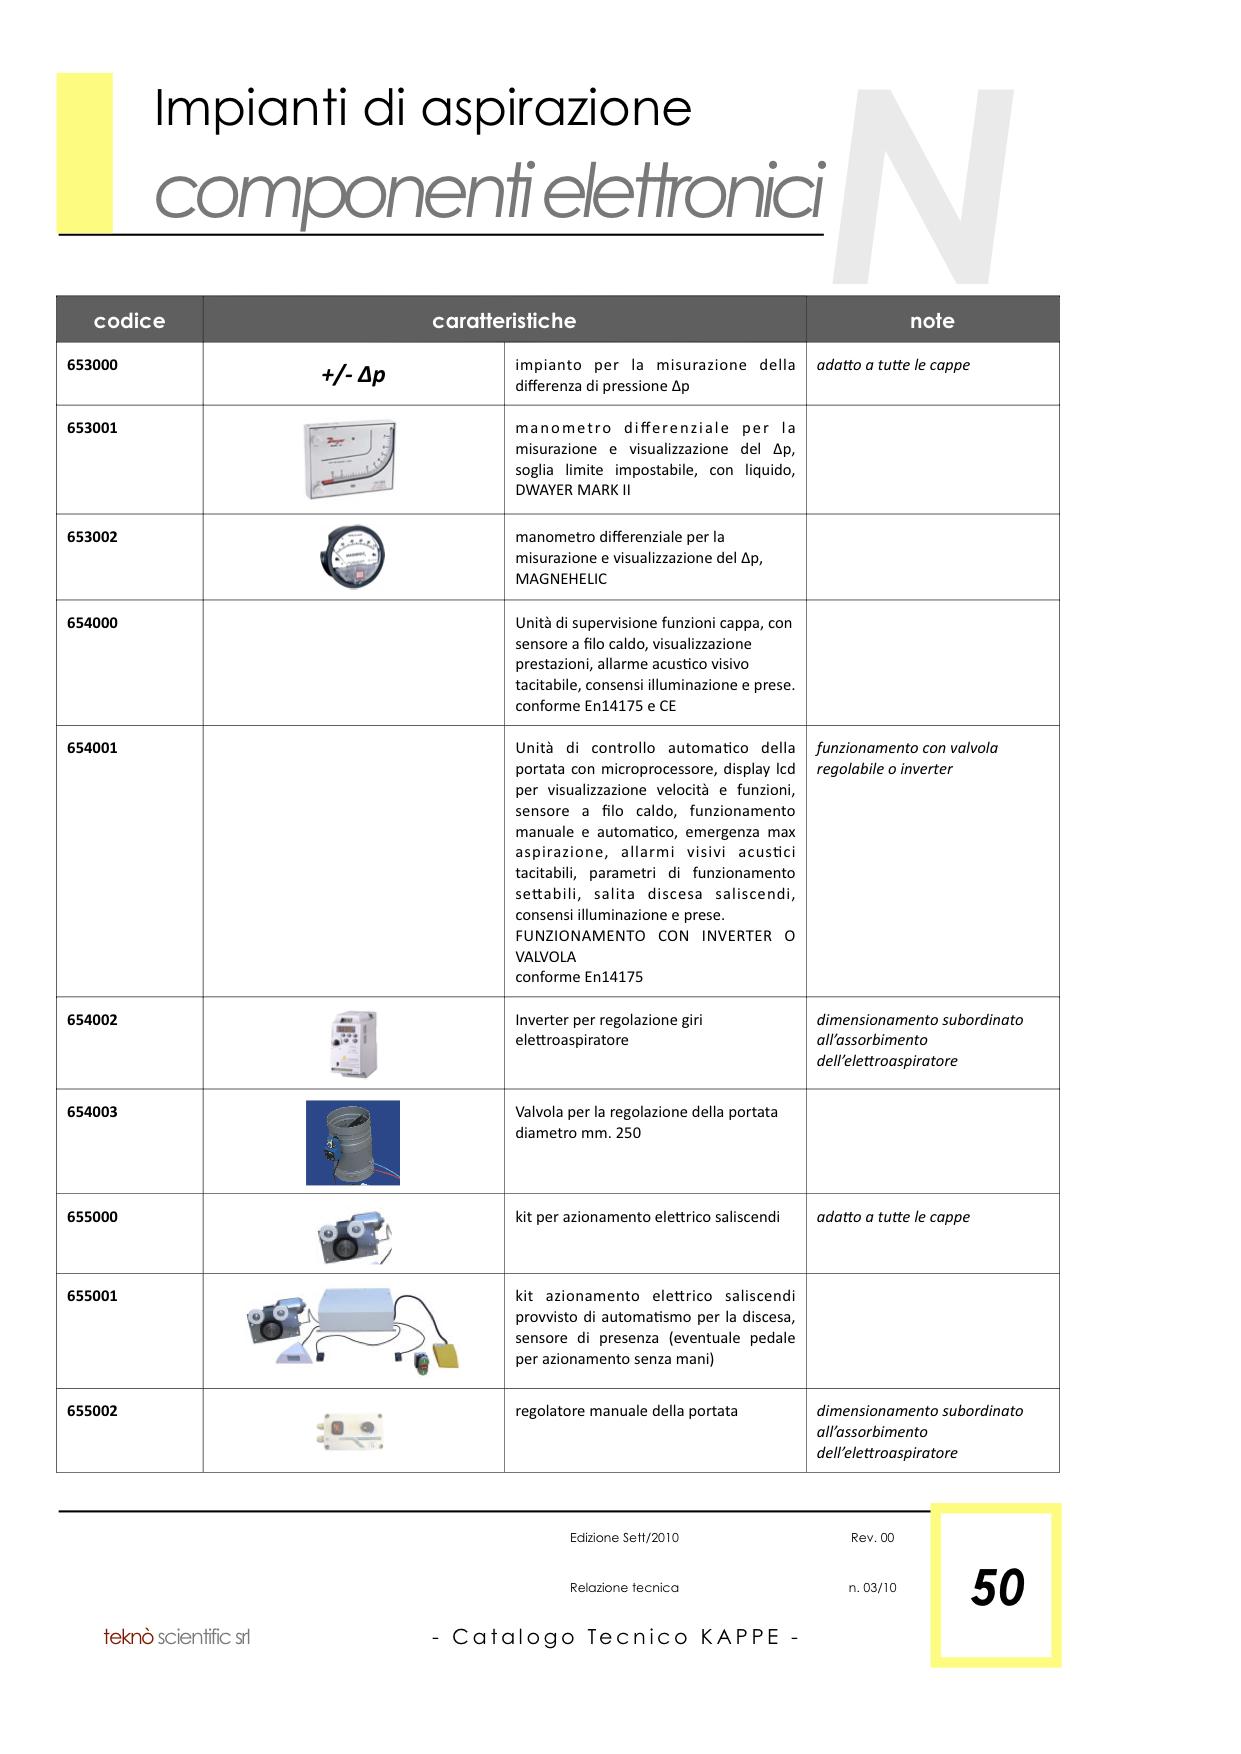 KAPPE Catalogo Tecnico Generale copia 20.png